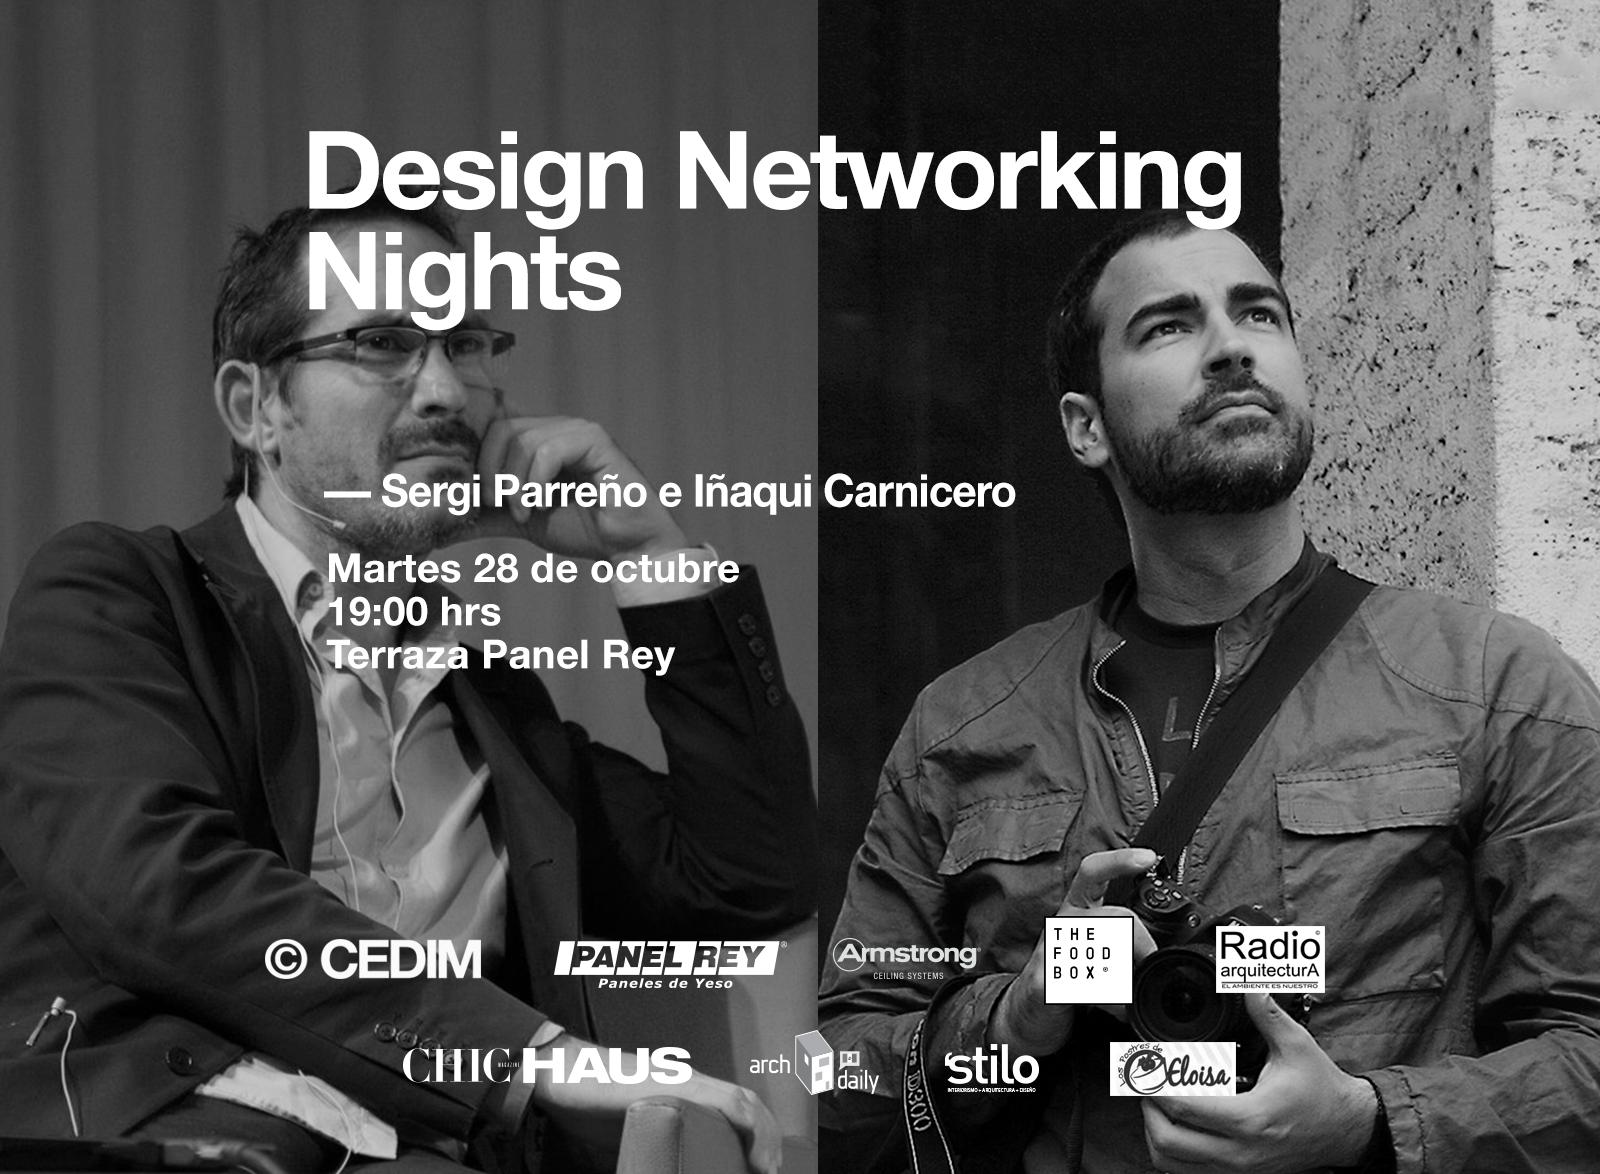 Design Networking Nights / Sergi Parreño + Iñaqui Carnicero.